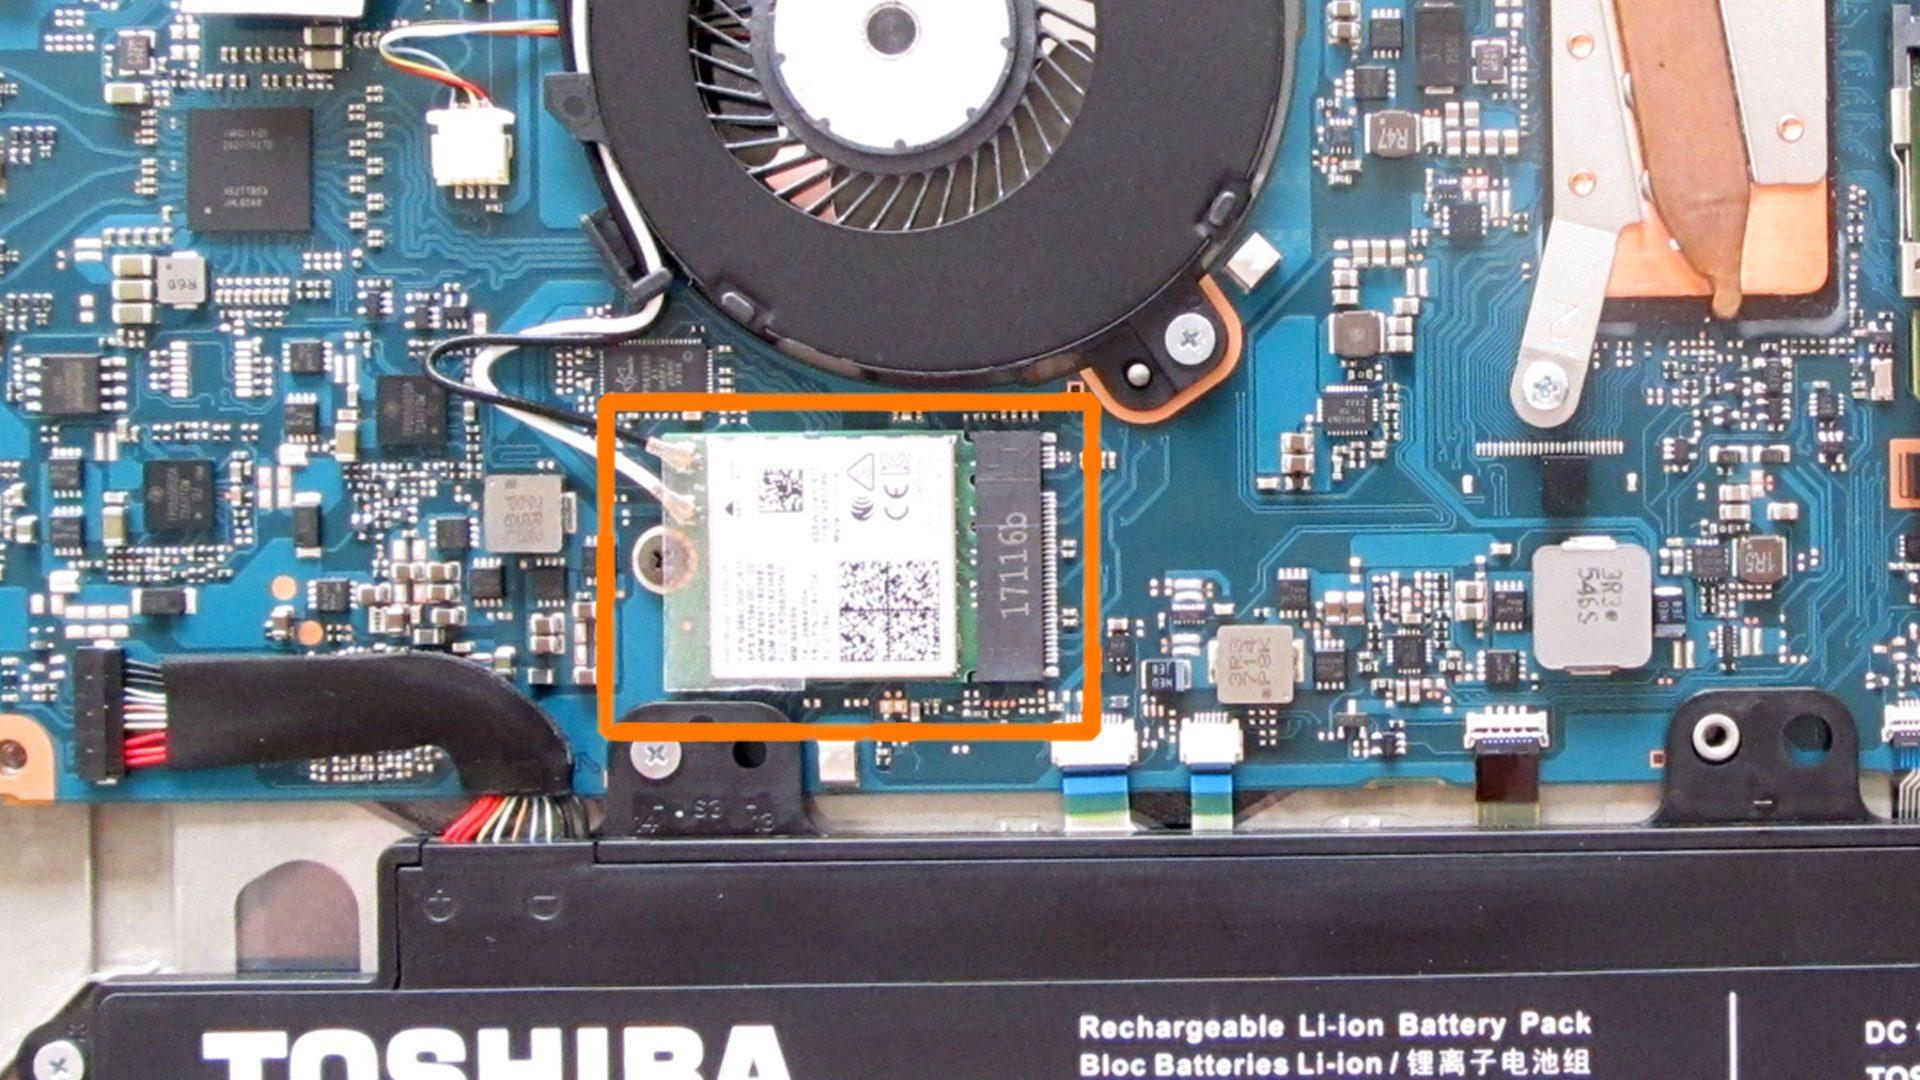 Toshiba-Tecra-x40-D-11F – Innen_6